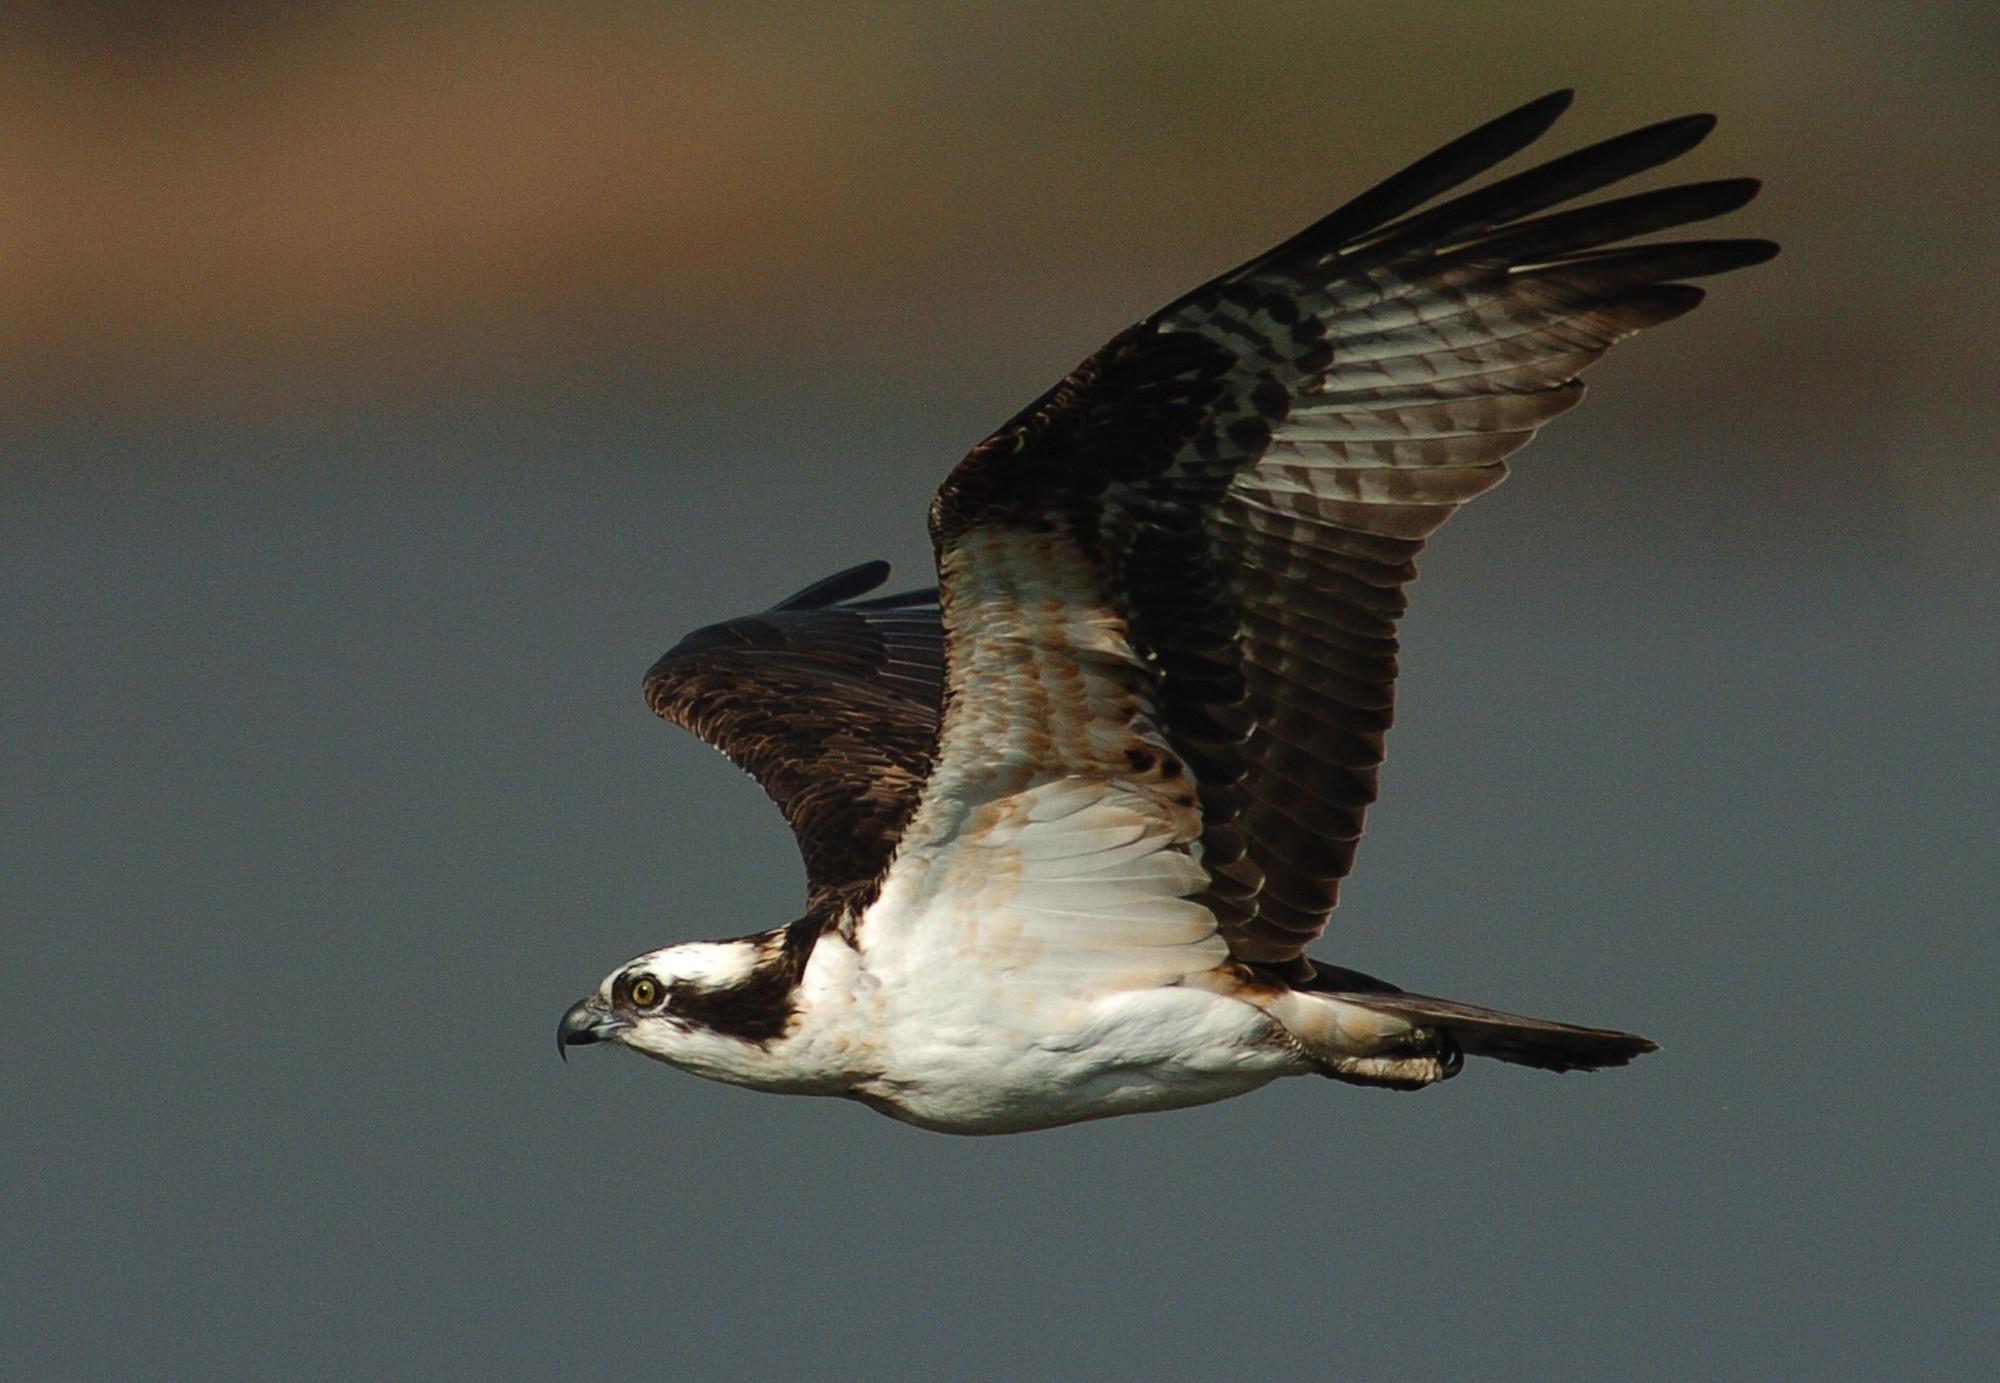 Ospreys 'thriving' in Chesapeake despite lingering toxins, study ...